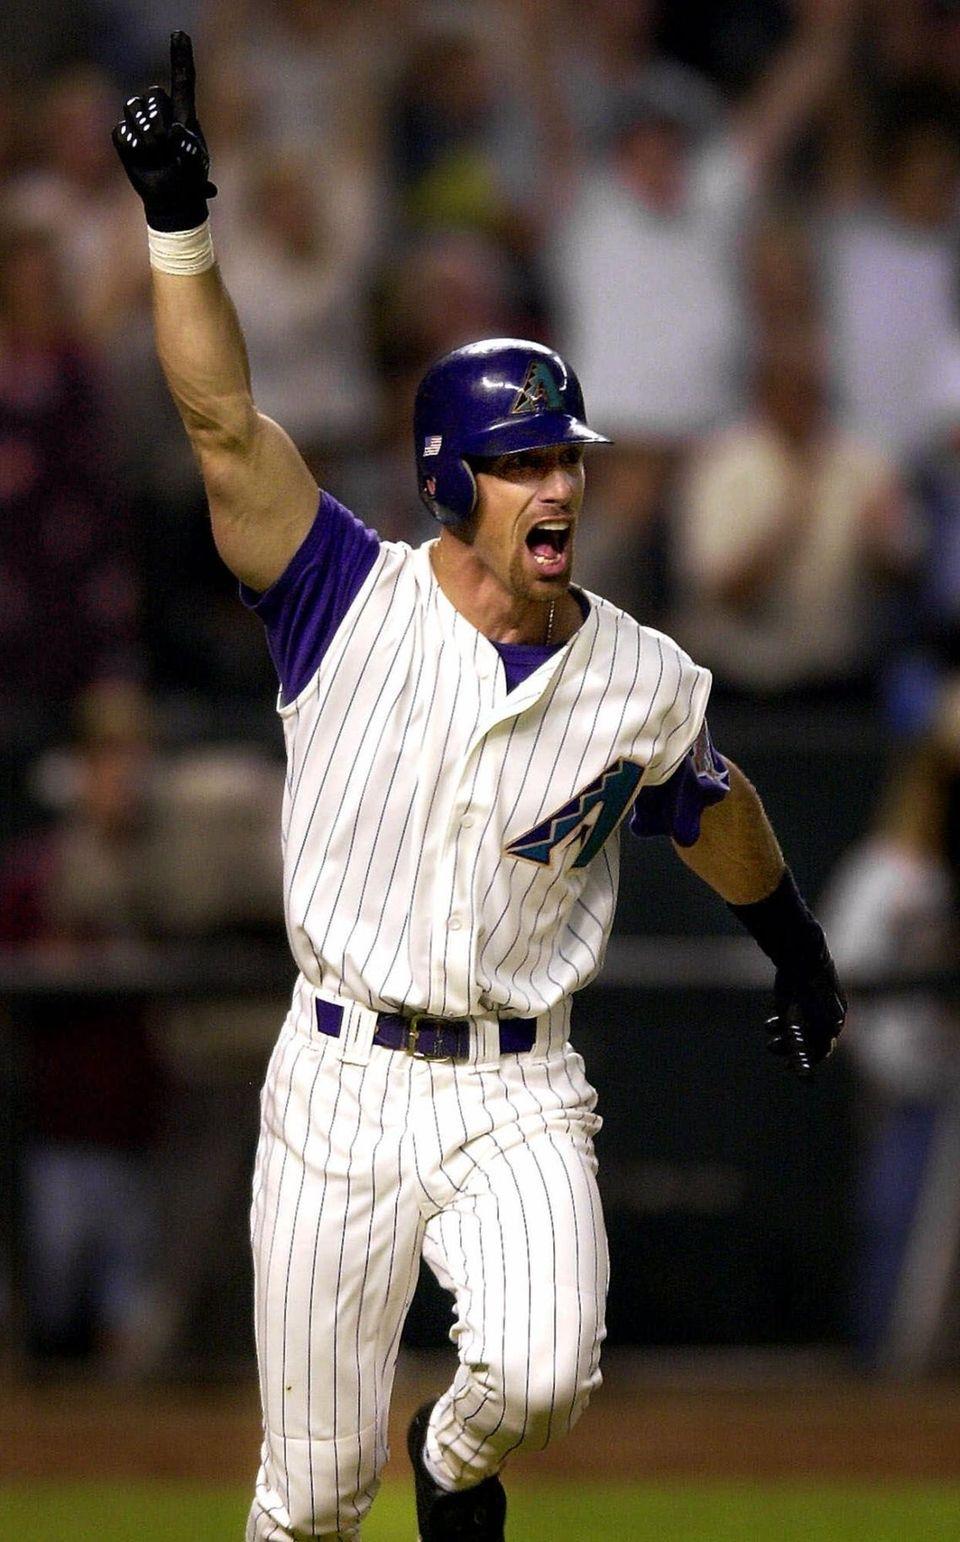 LUIS GONZALEZ 2001, Arizona Diamondbacks 57 home runs